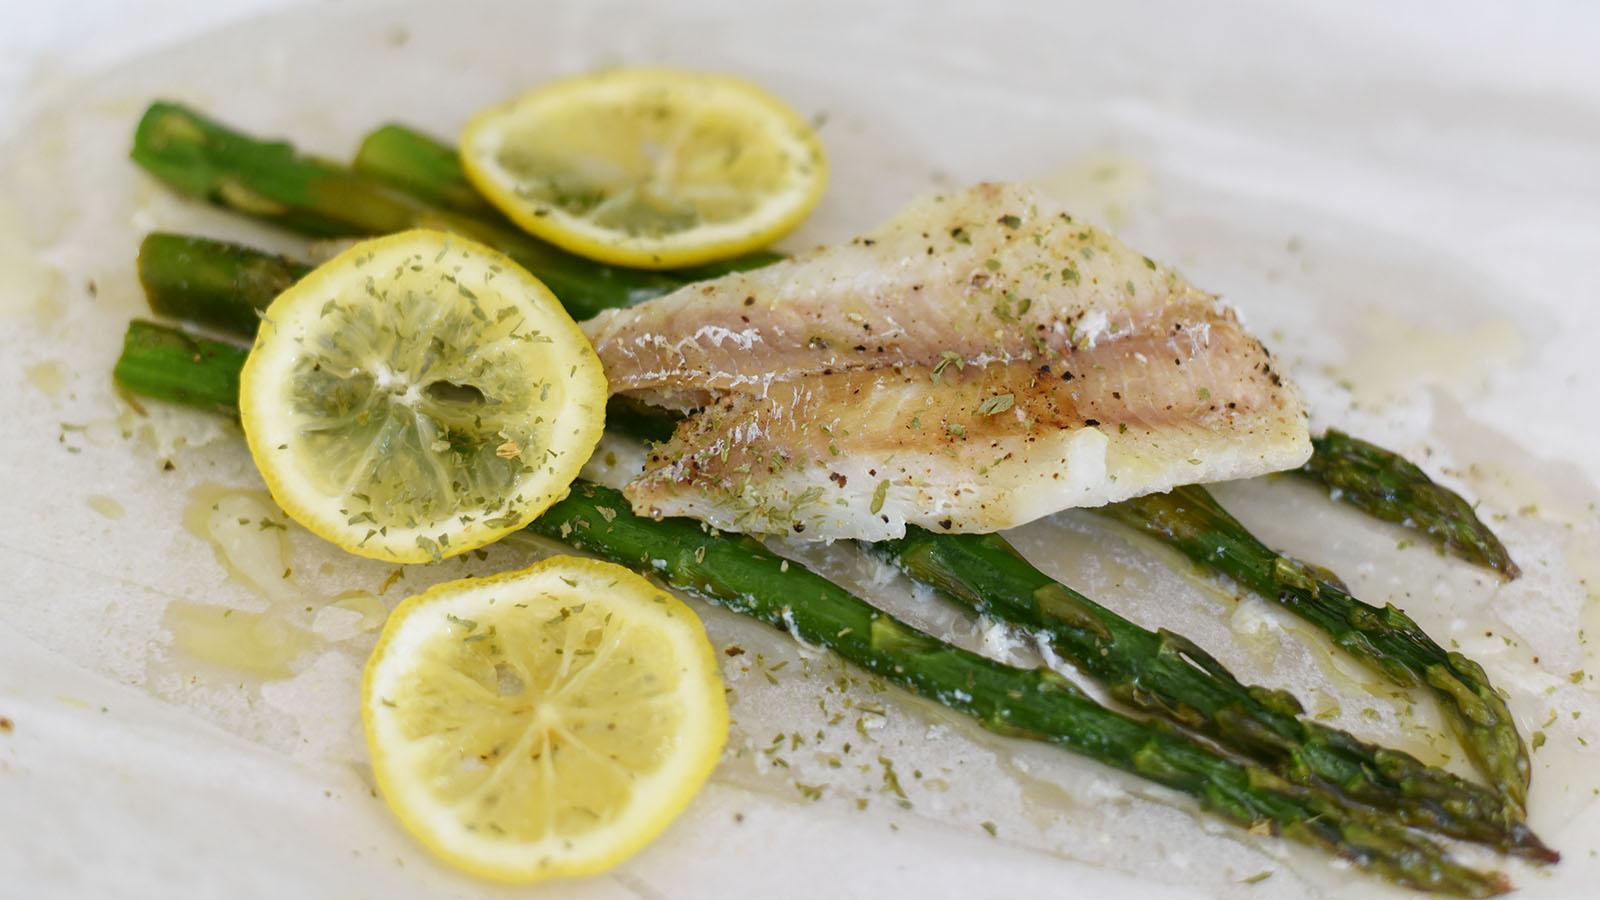 Steamed Lemon Pepper Fish and Asparagus Packet